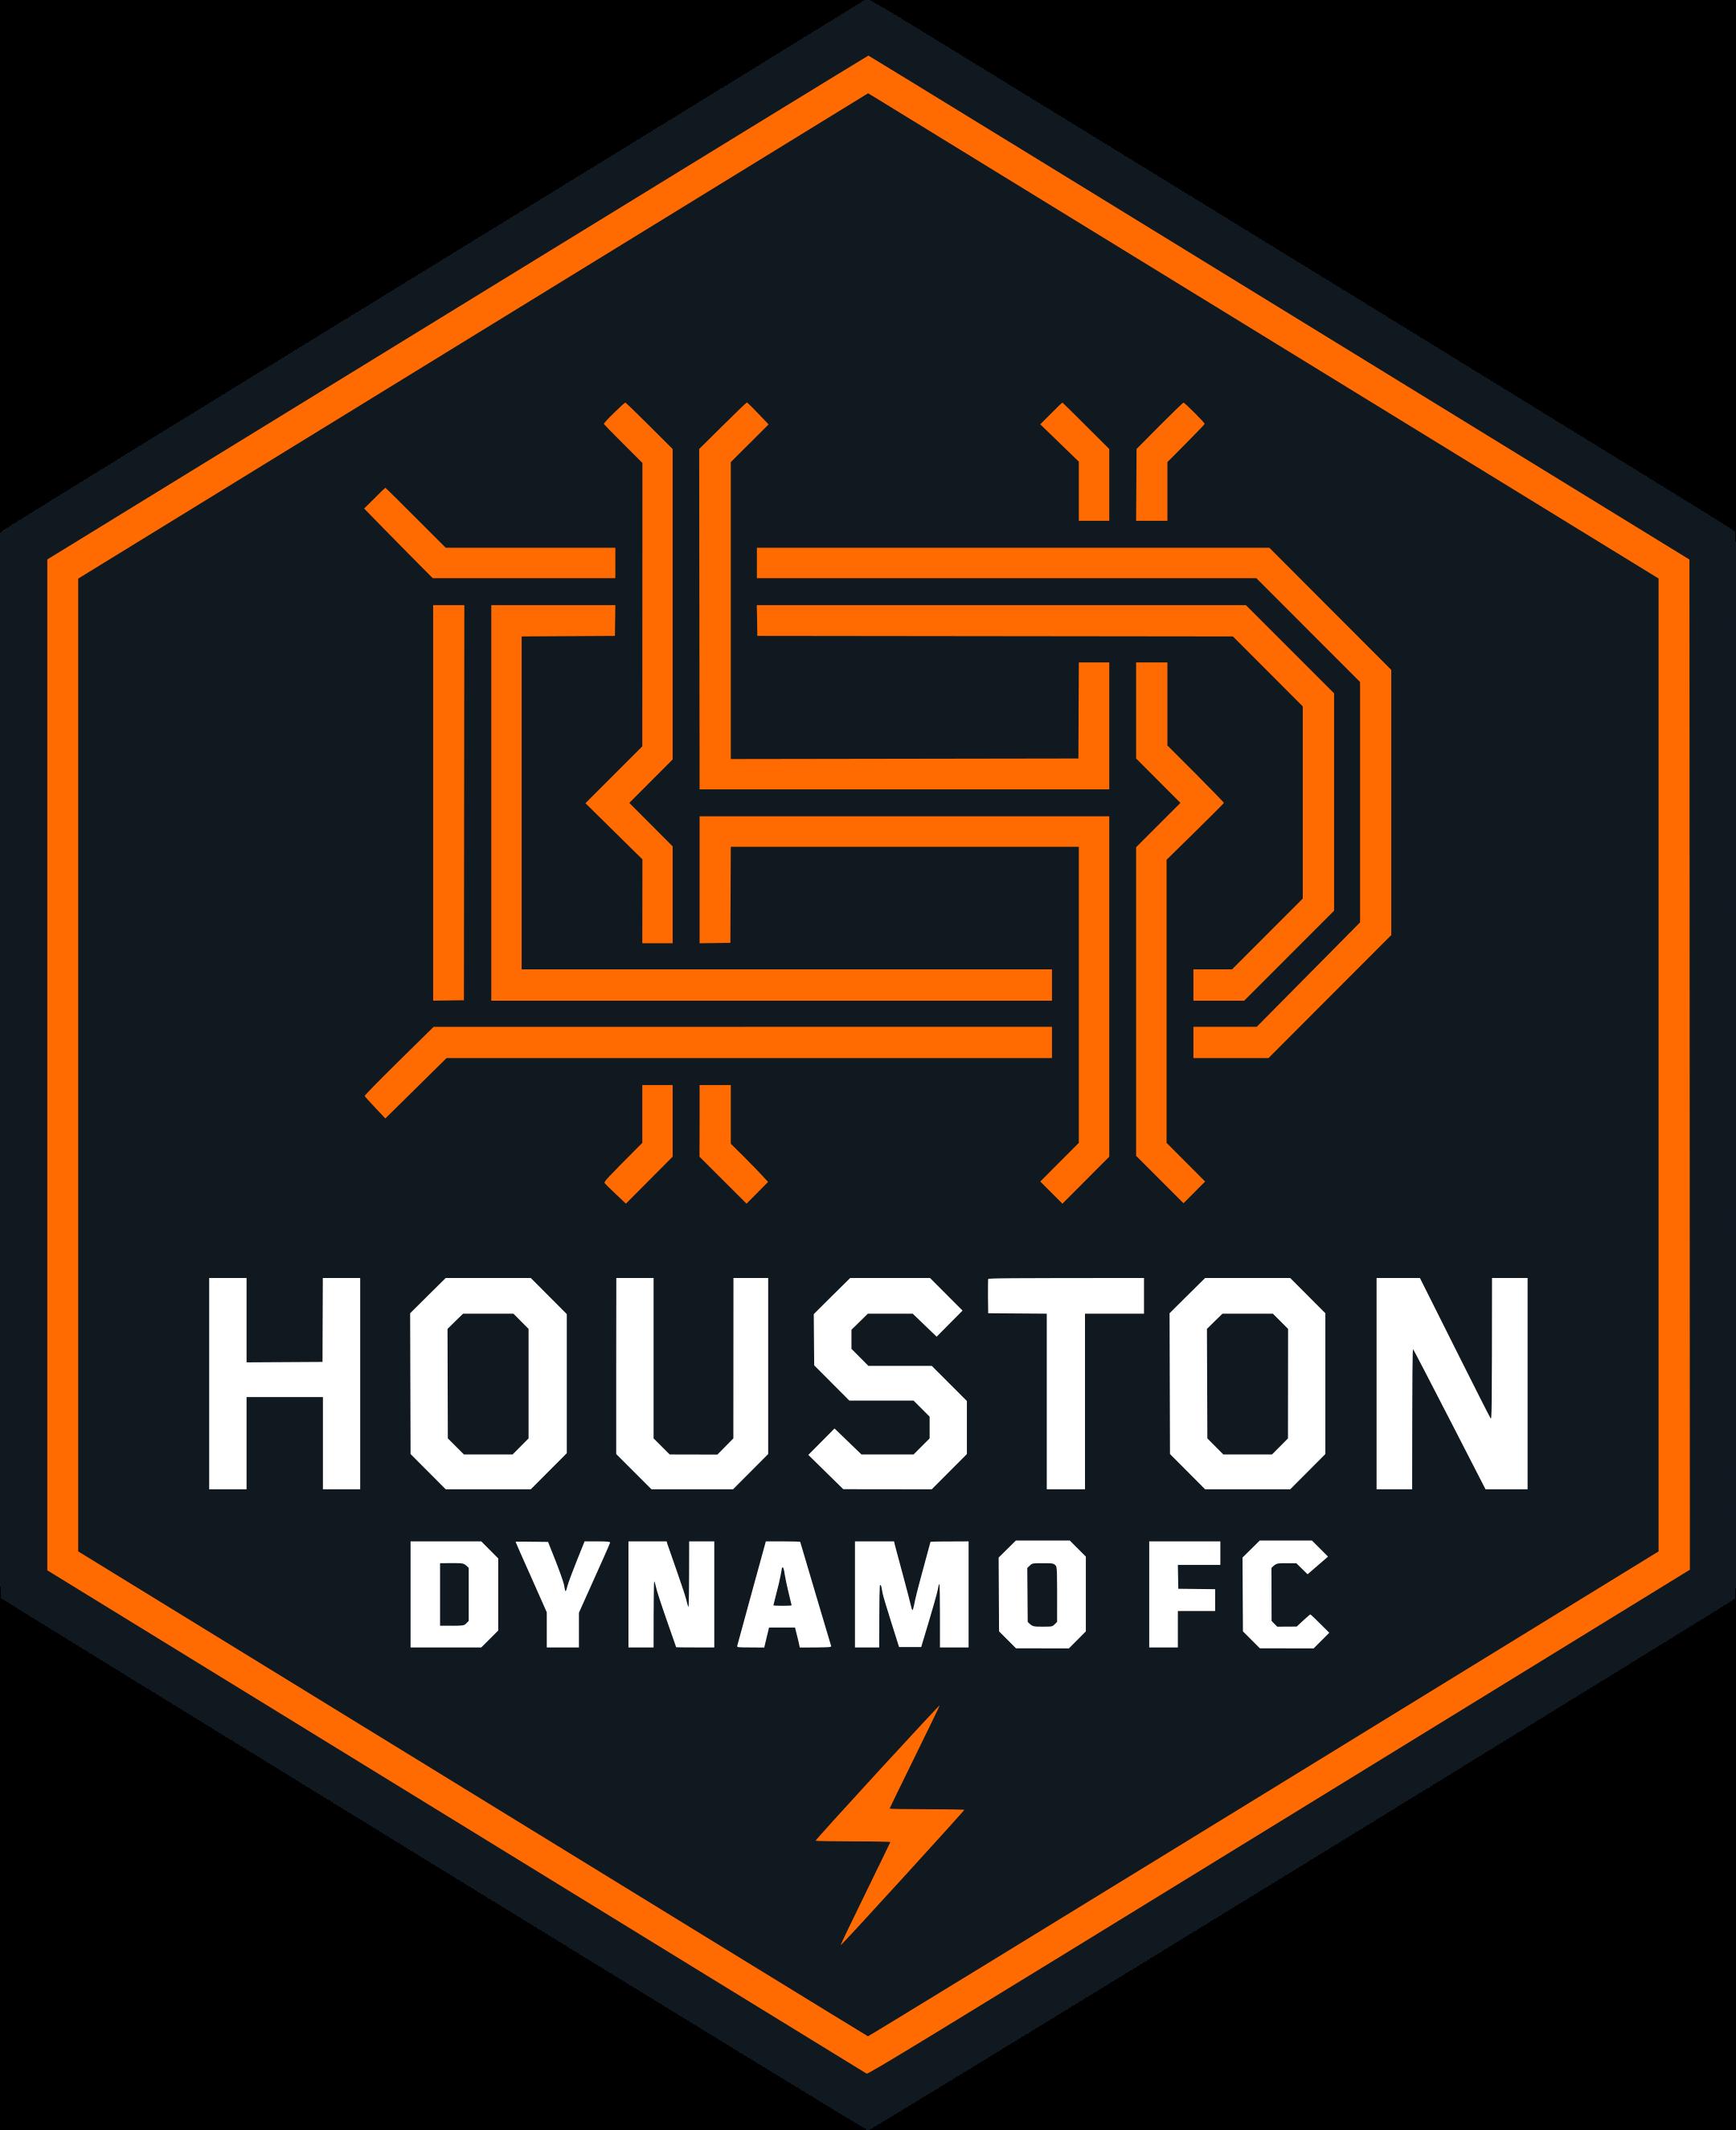 houston dynamo fc logo 1 - Houston Dynamo Logo